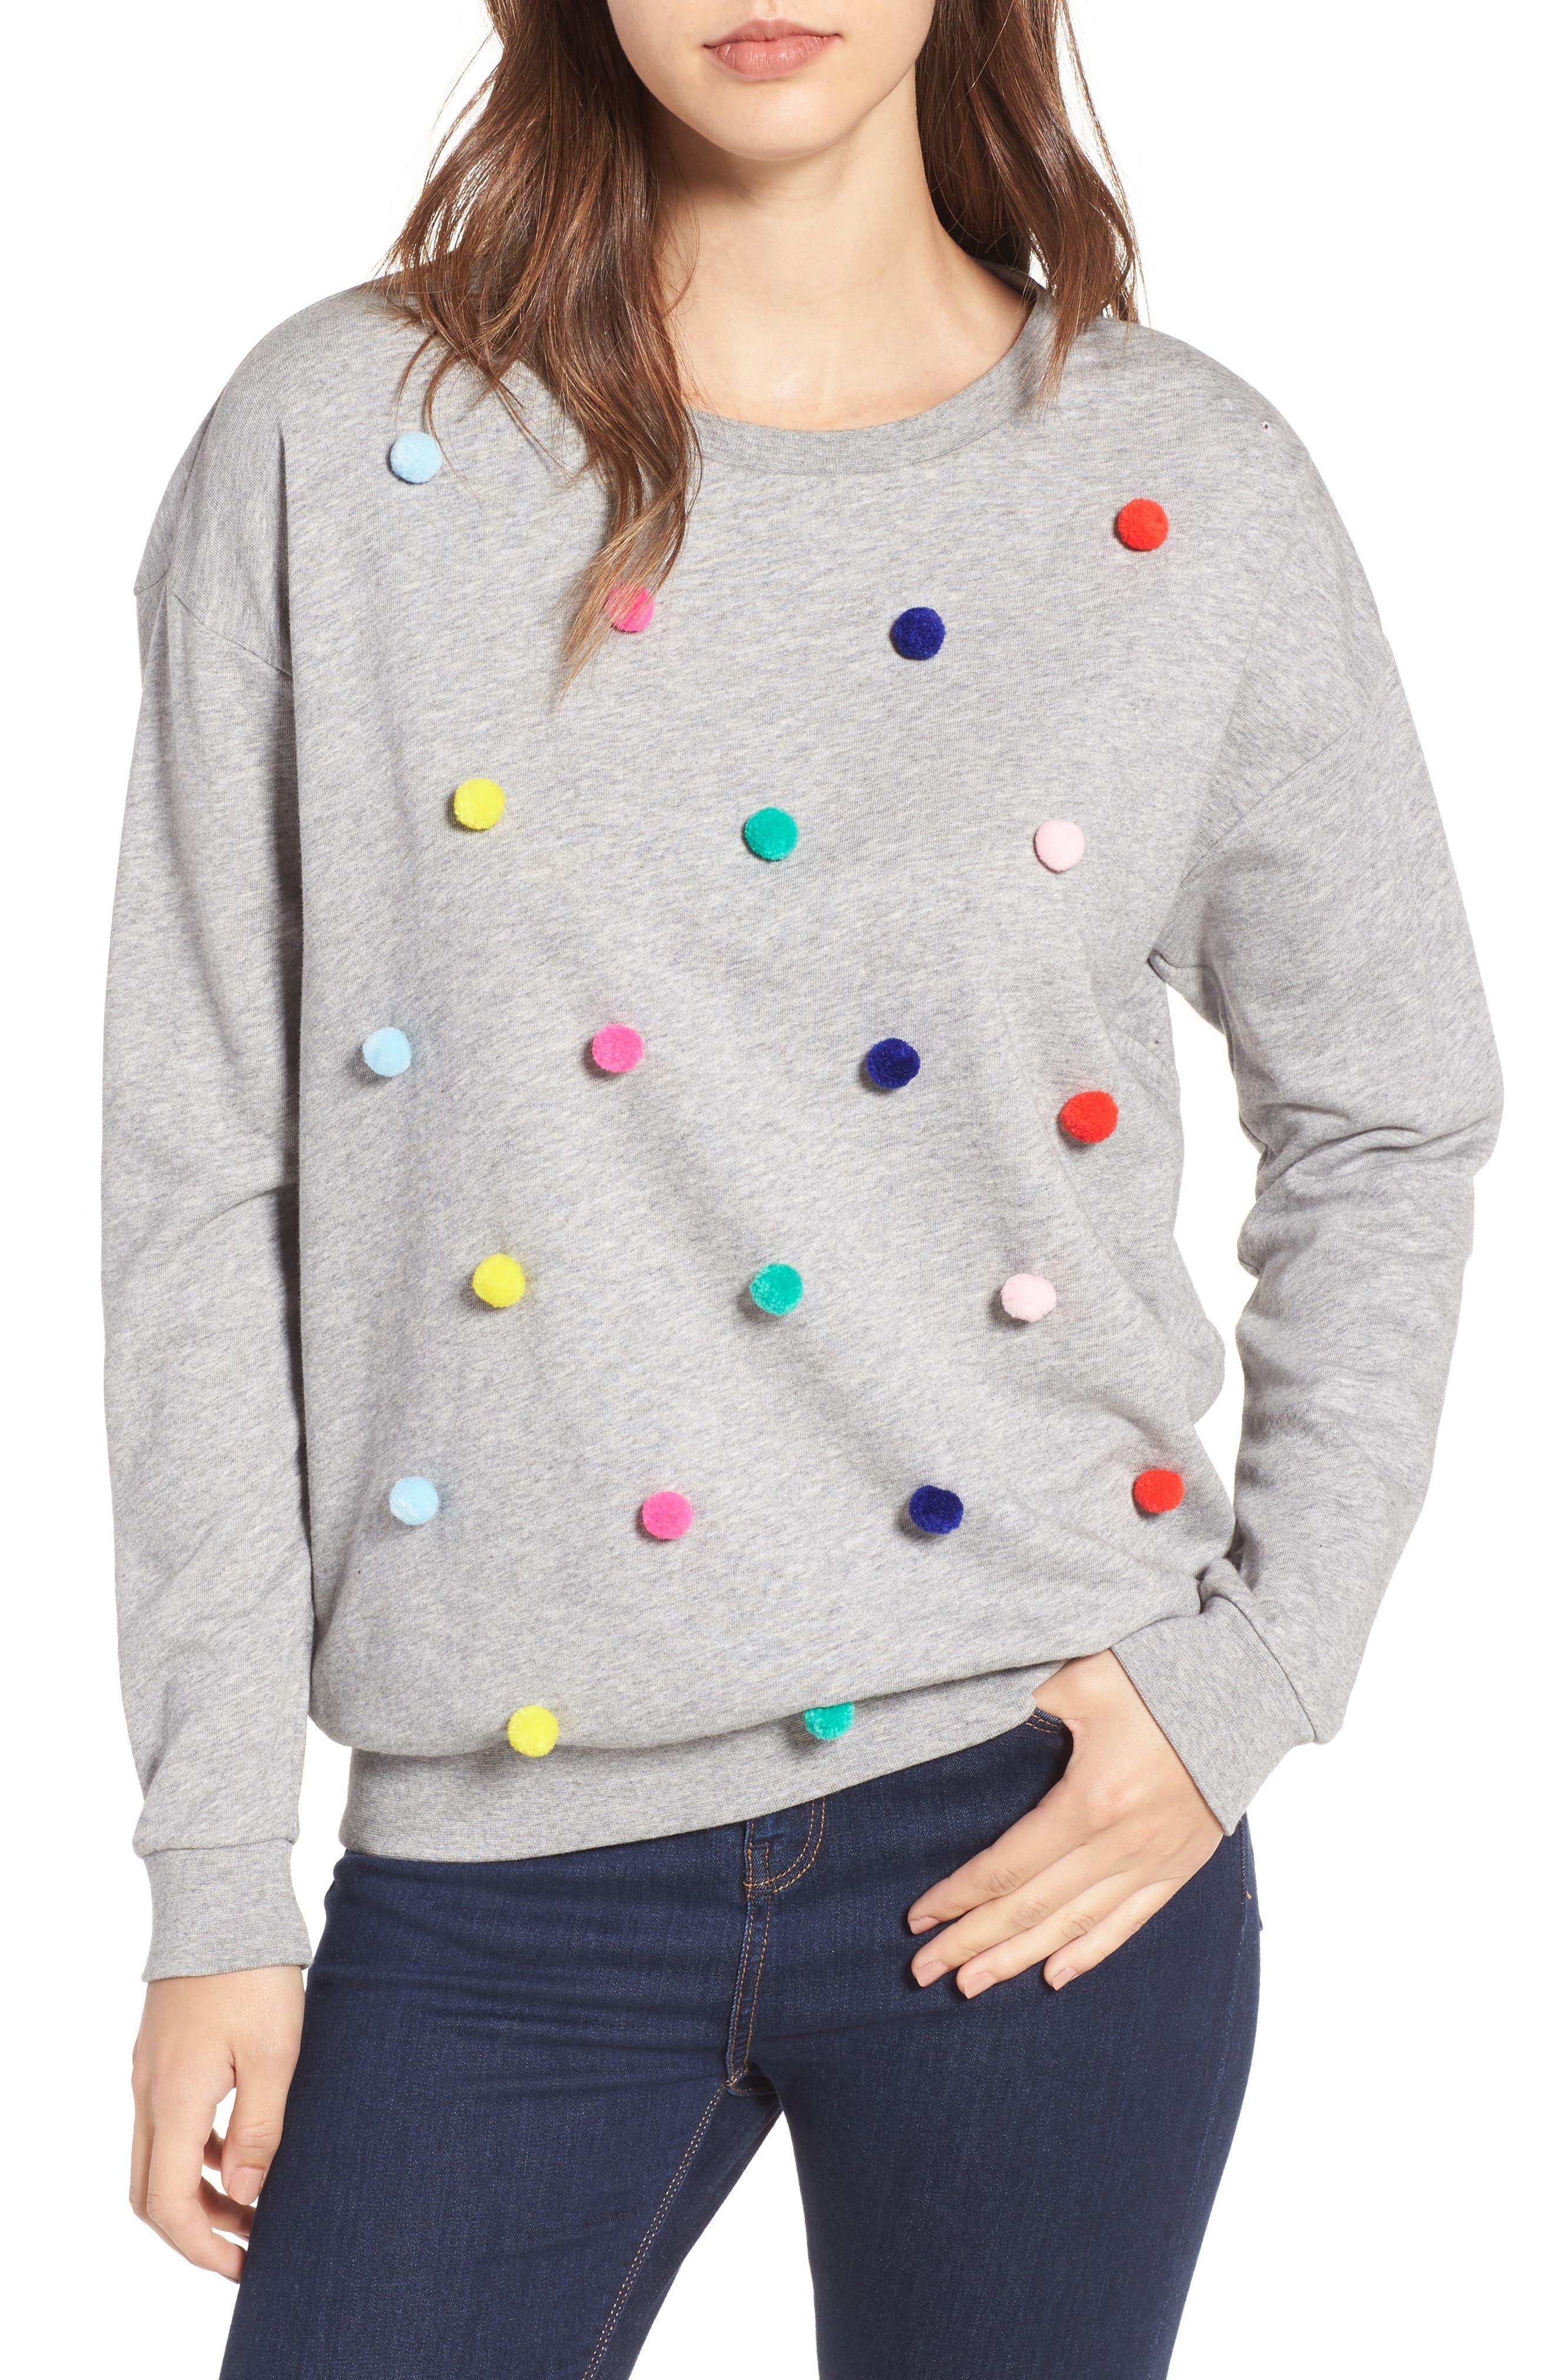 Pompom Sweatshirt,                             Main thumbnail 1, color,                             Grey